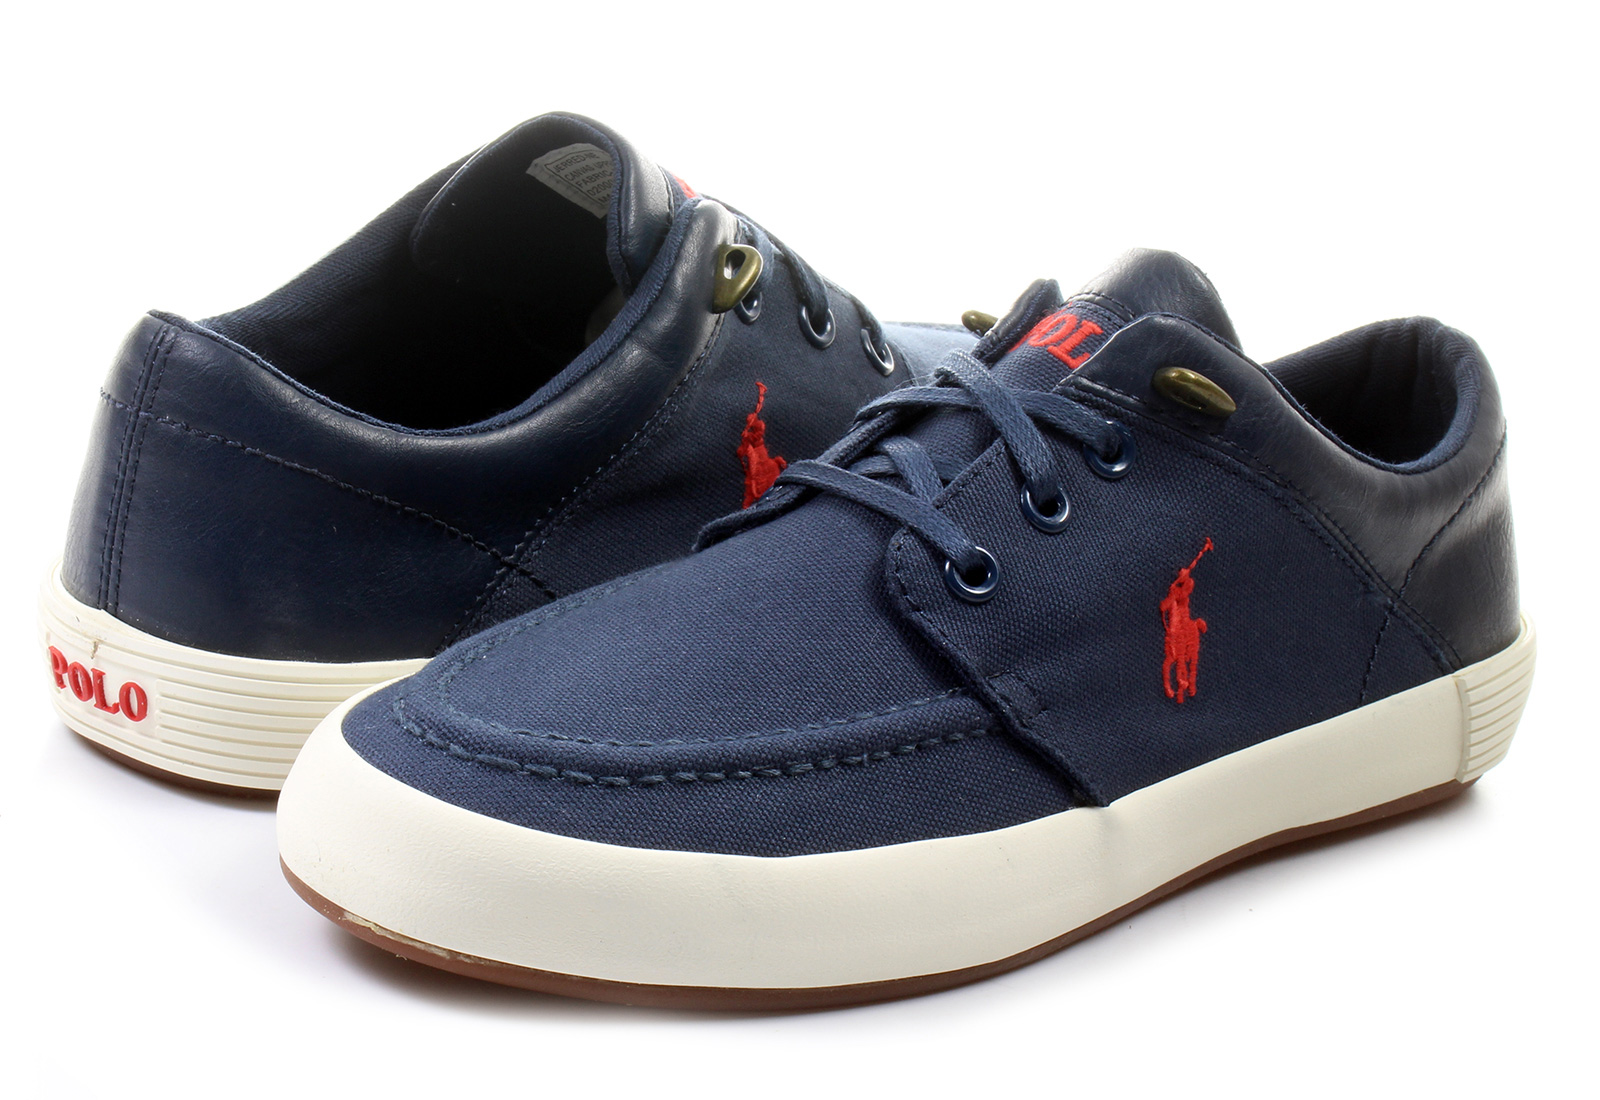 Black High Top Polo Shoes